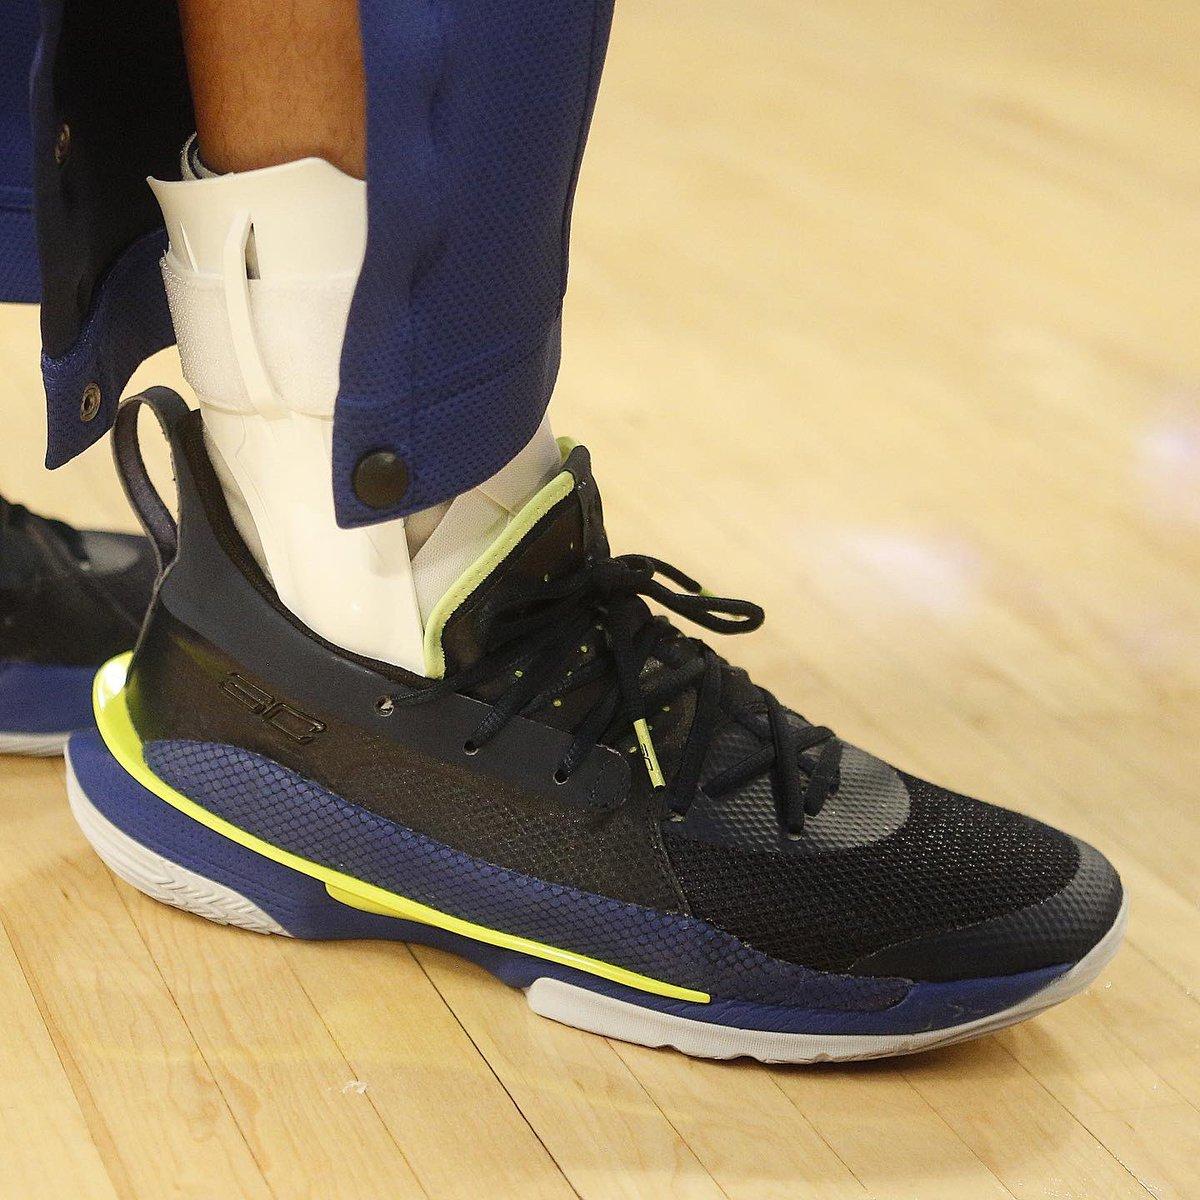 #RT @NBA: RT @NBAKicks: Stephen Curry in the Under Armour Curry 7 in LA! #NBAKicks